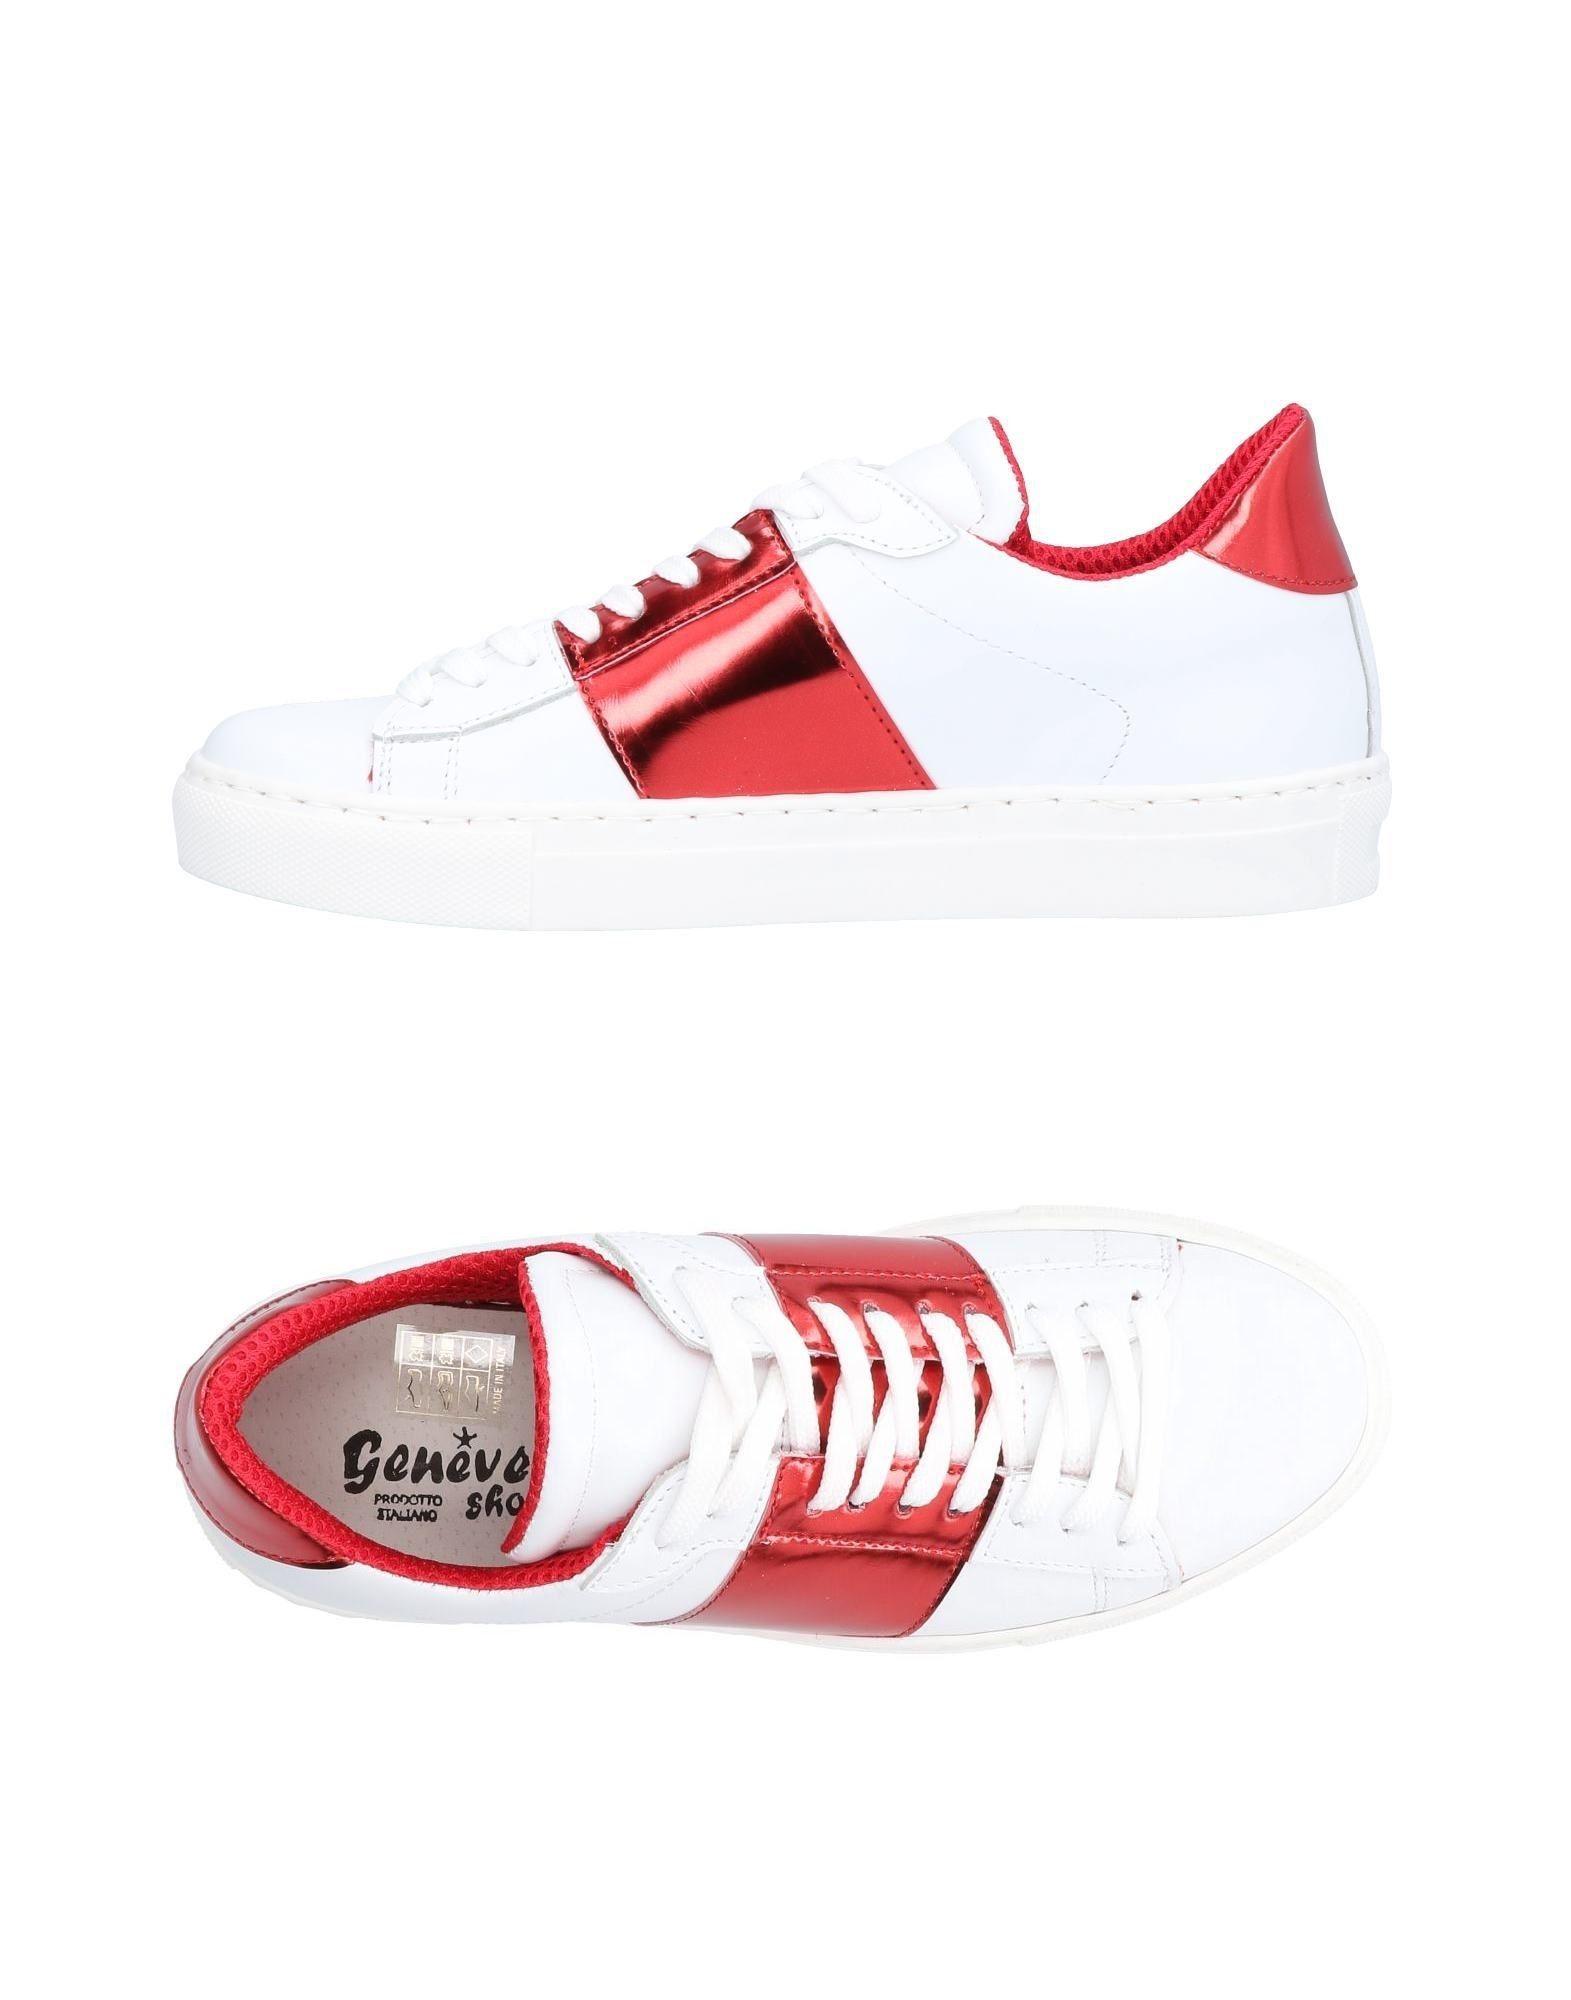 Geneve Sneakers - Women Geneve Sneakers online on    United Kingdom - 11470253FC 61c7e8